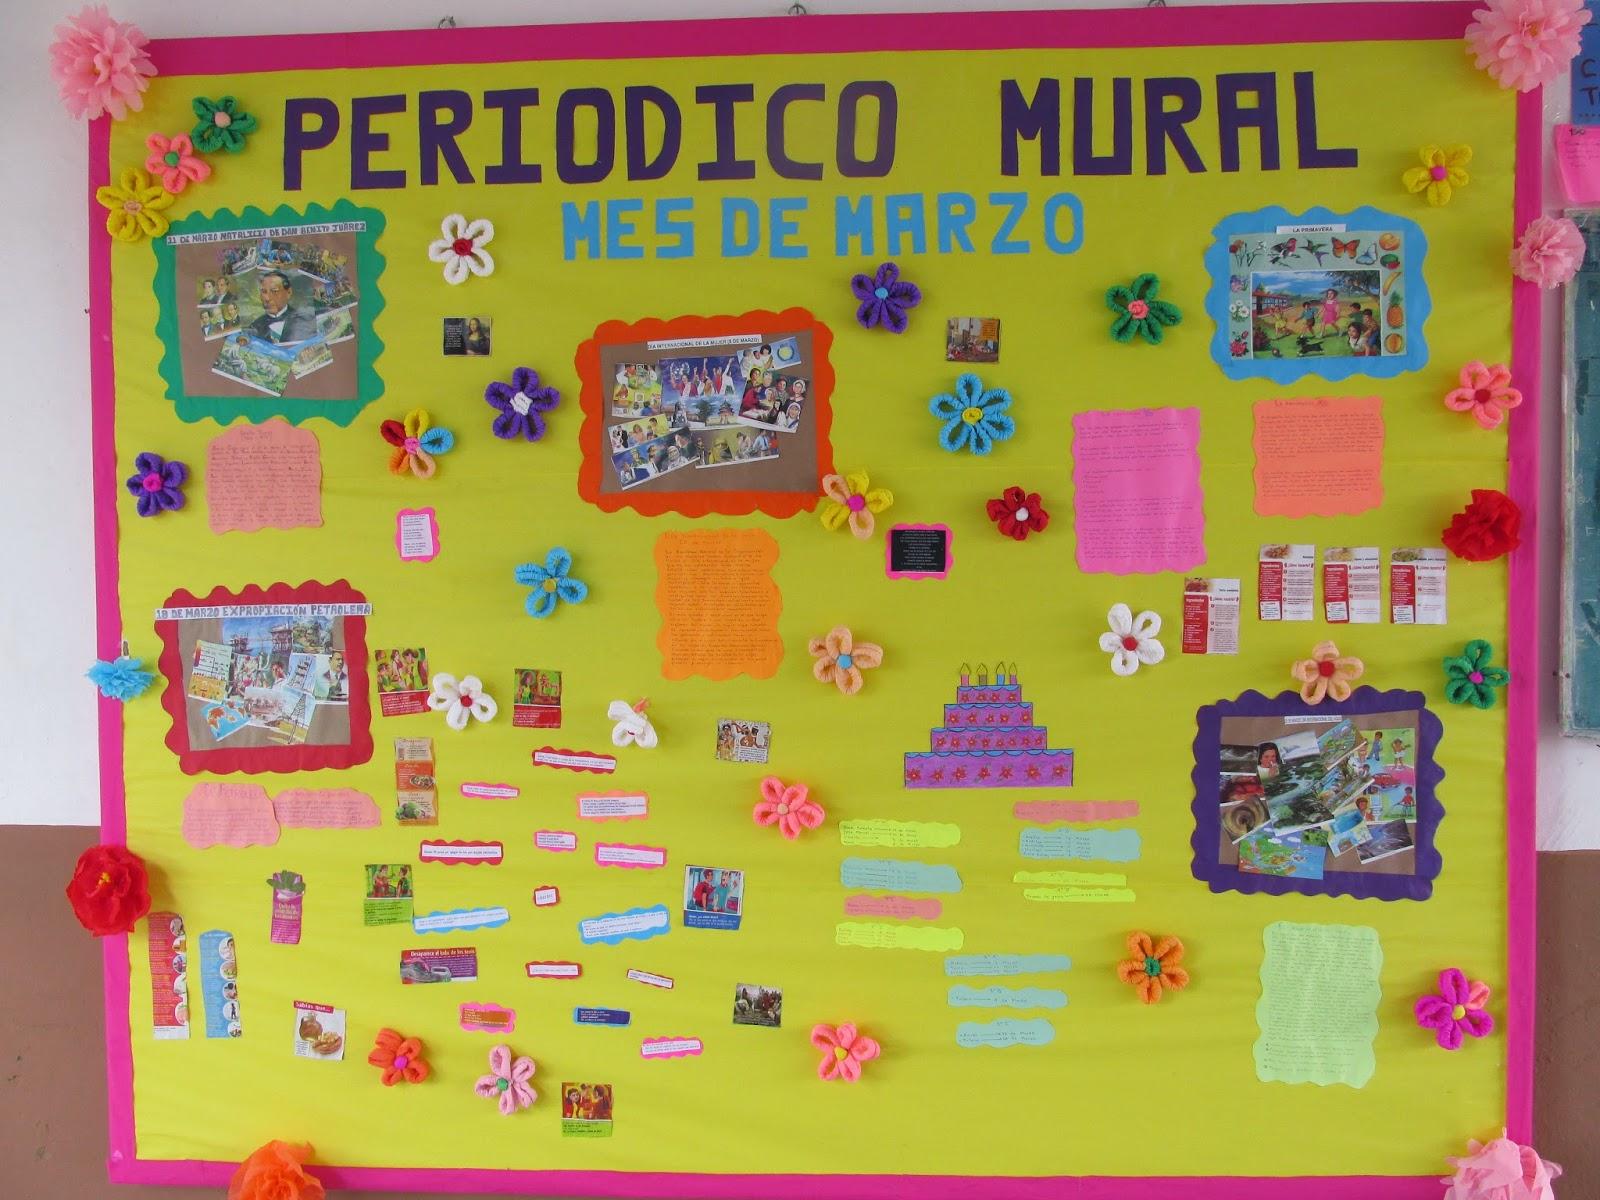 Peri dico mural marzo 7 imagenes educativas for El periodico mural wikipedia